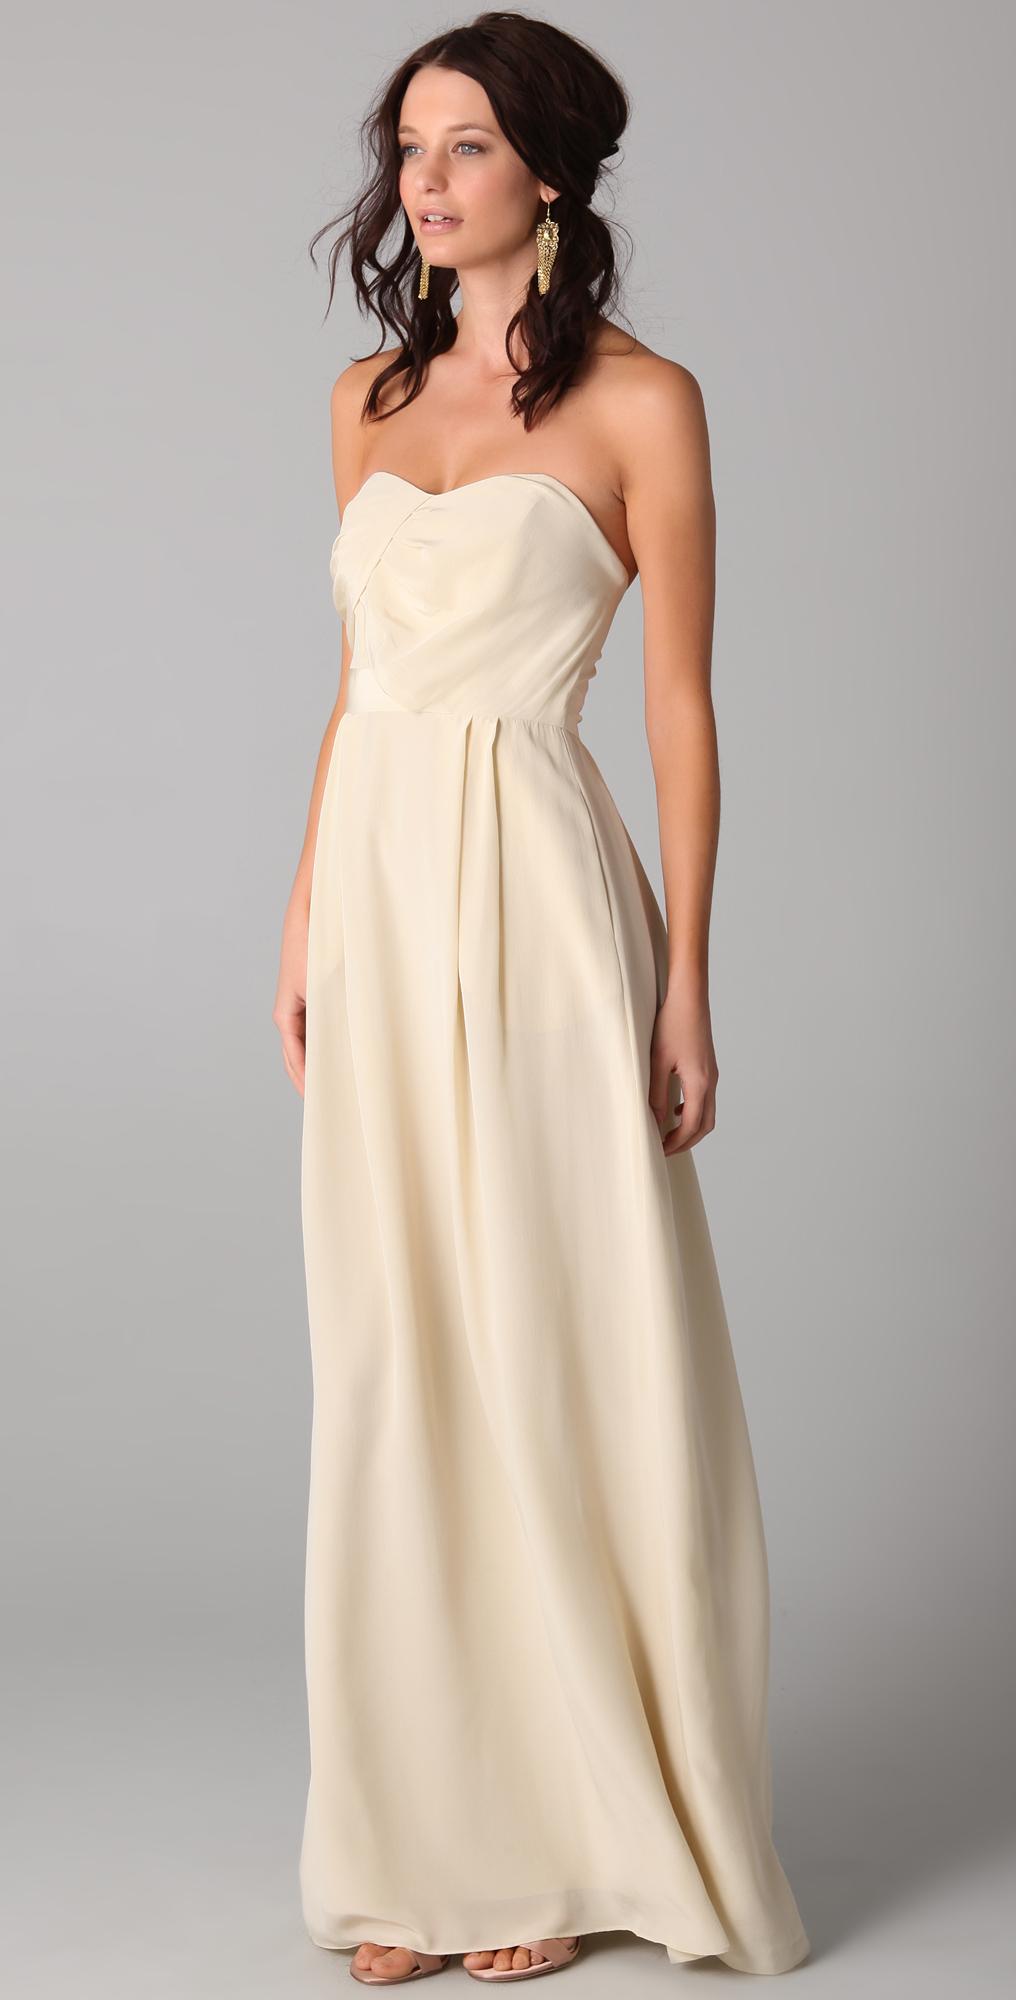 acf229ddb9b6 Zimmermann Strapless Tucked Maxi Dress | SHOPBOP